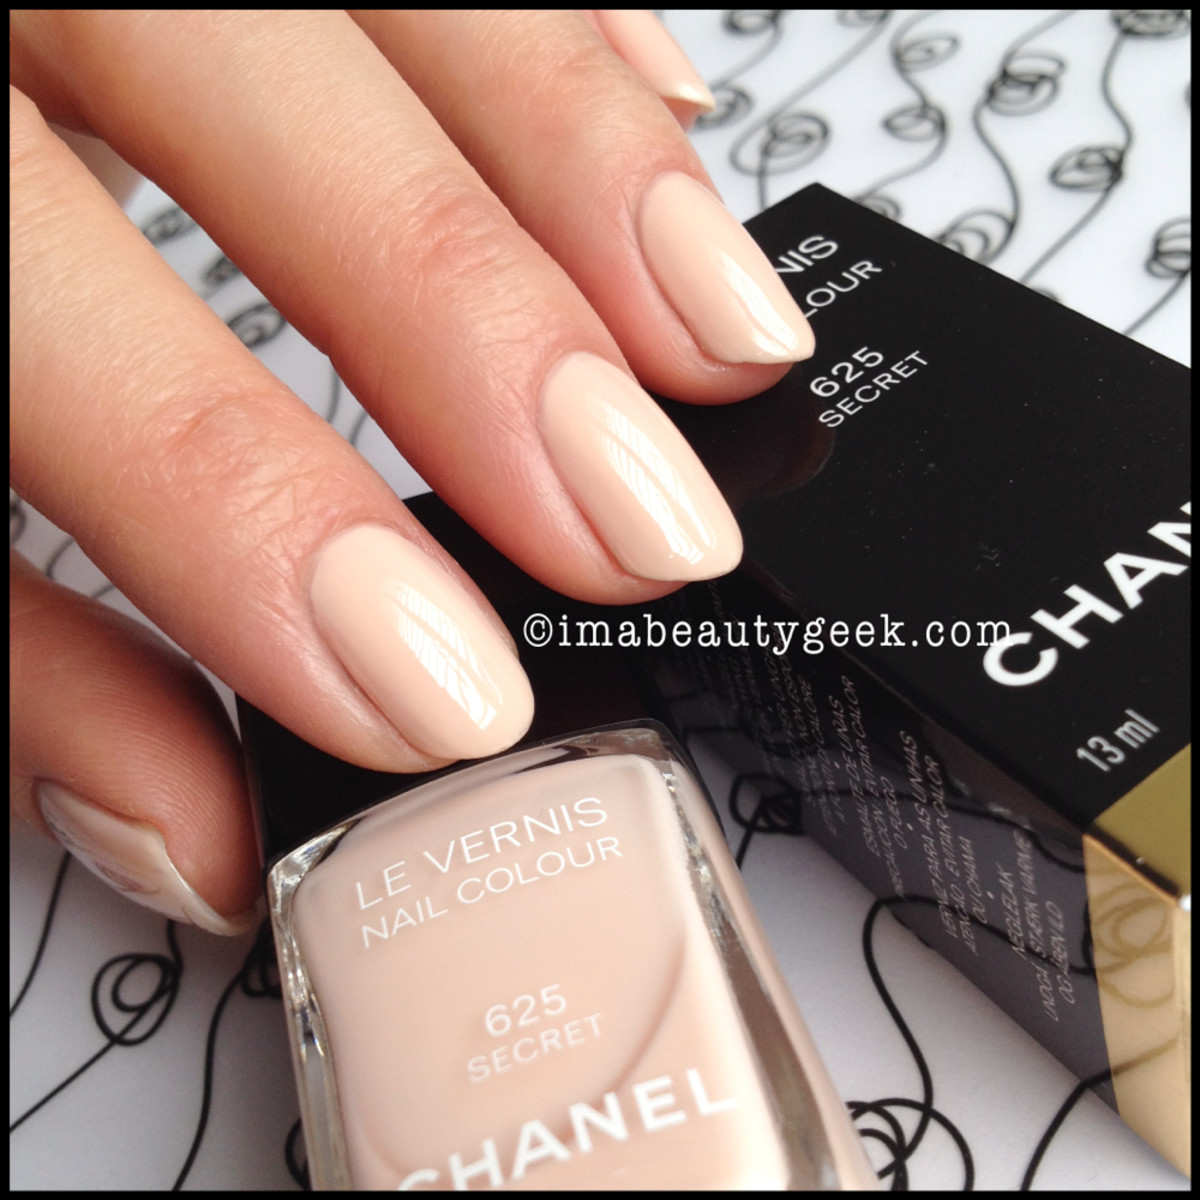 Chanel Vernis Secret 625